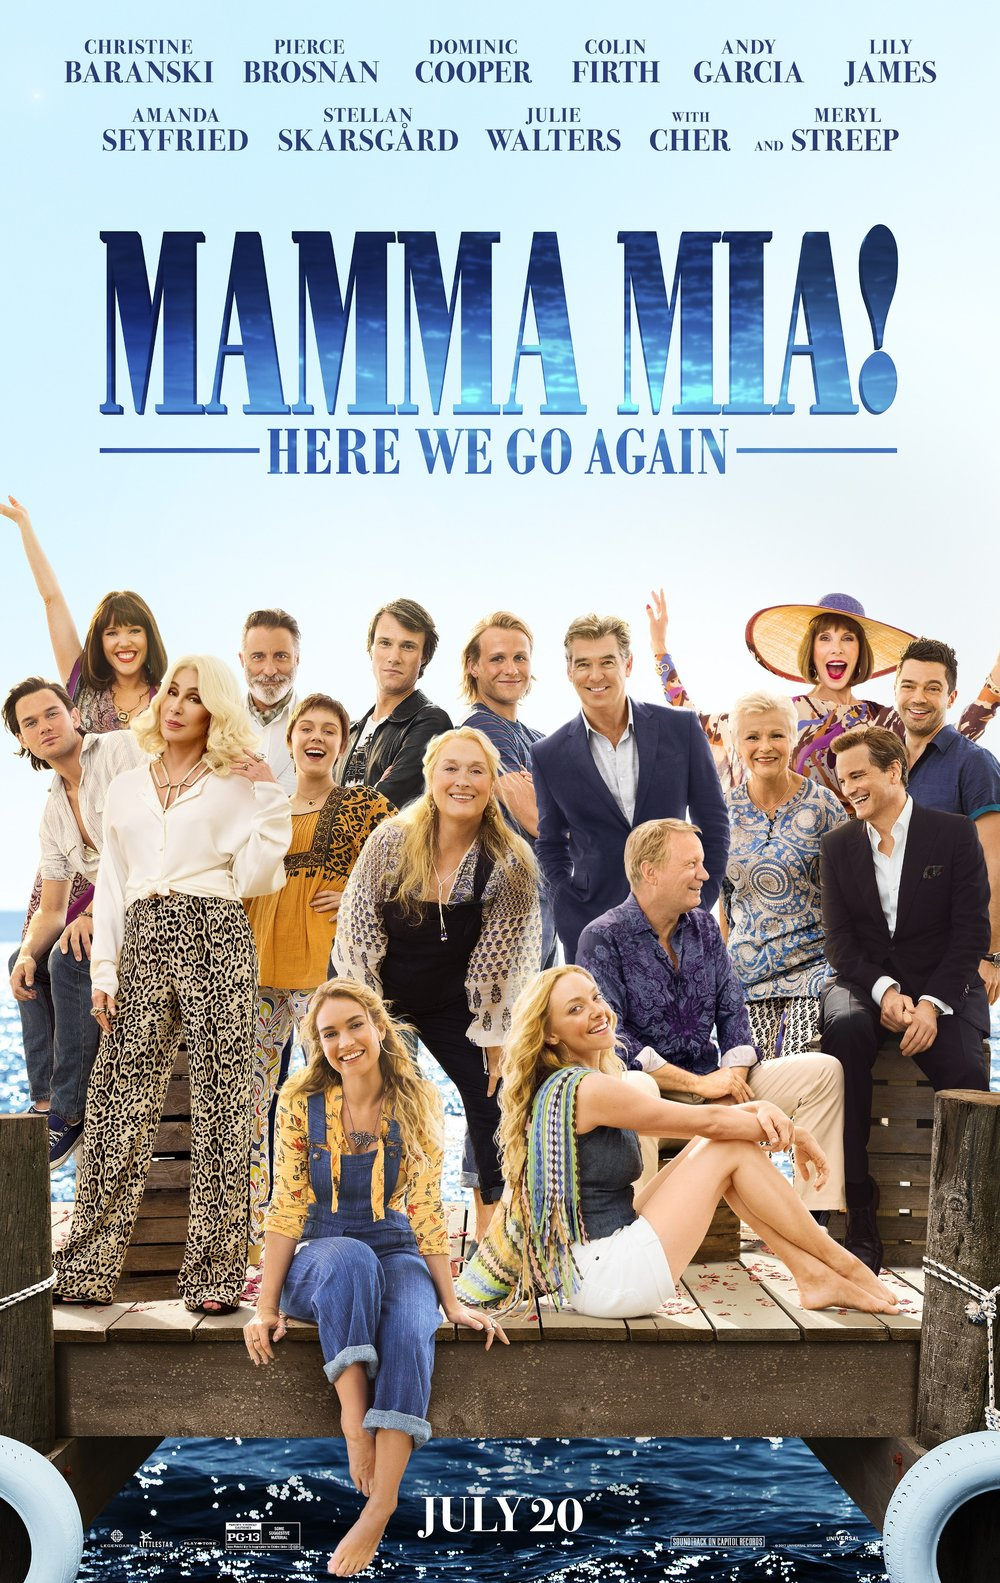 mamma_mia_here_we_go_again_poster.jpg